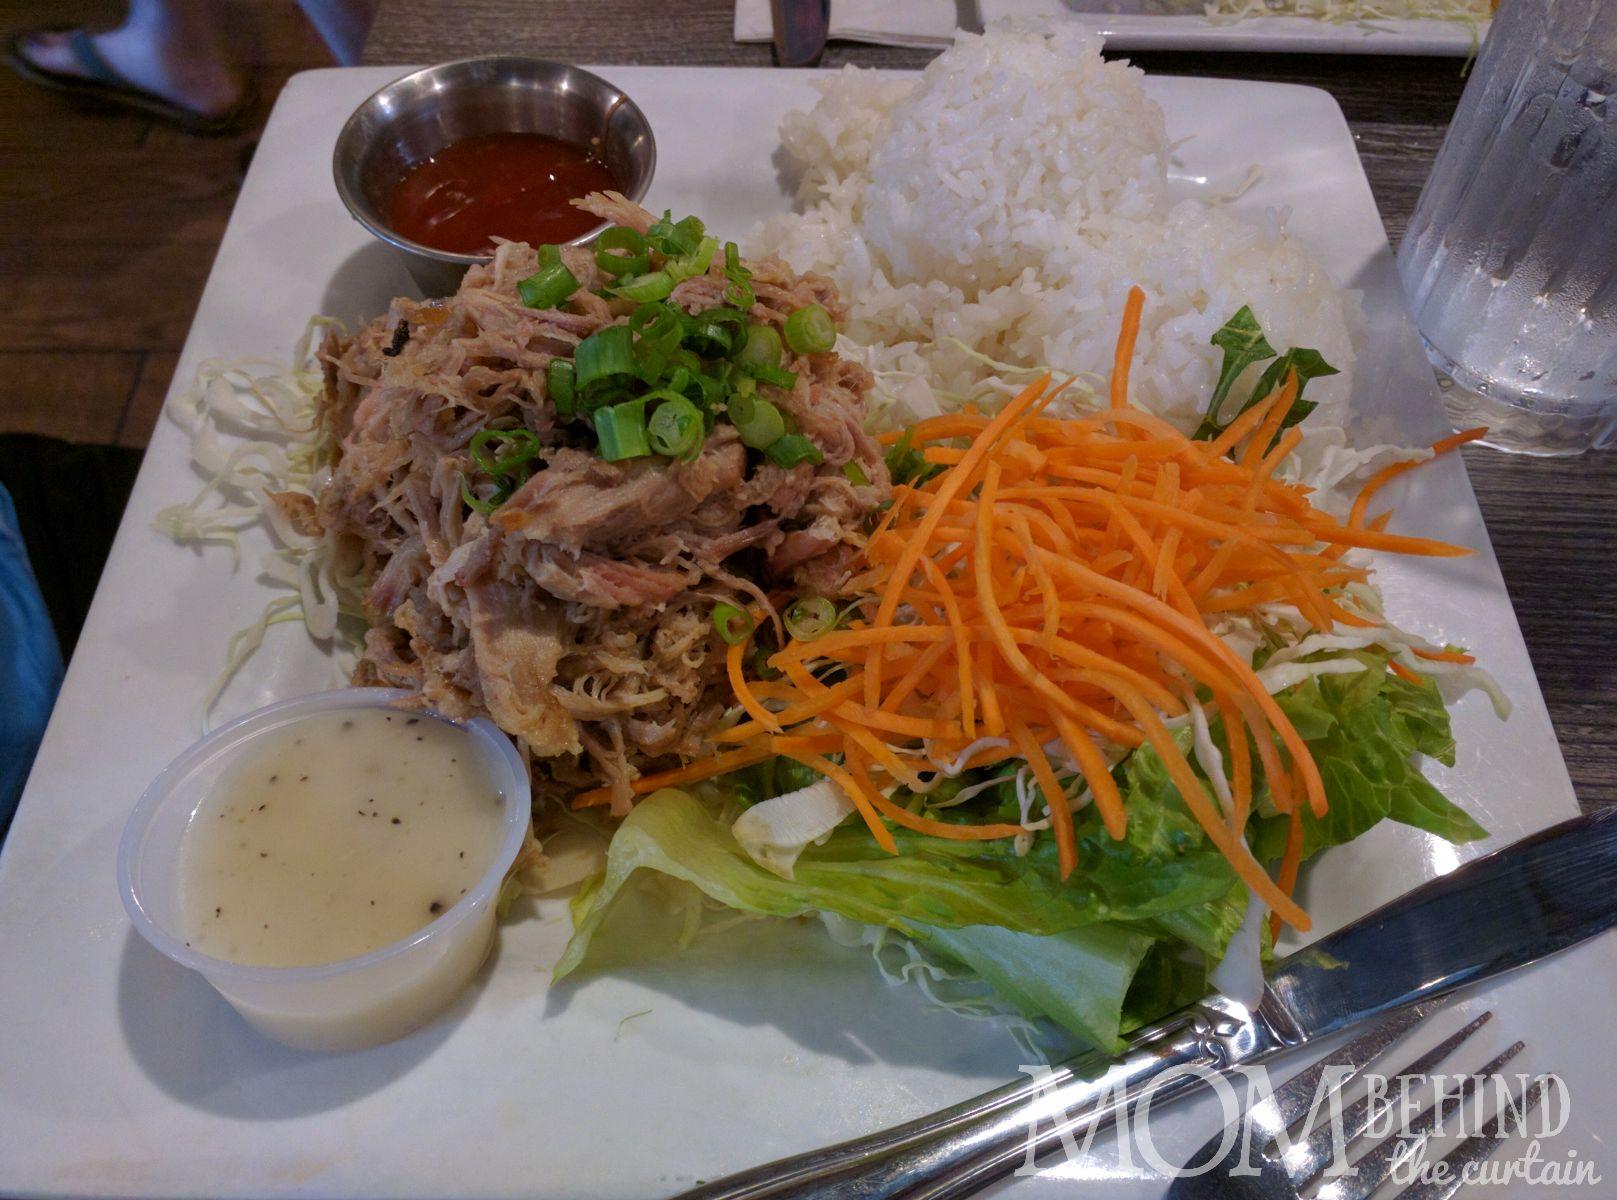 Best dinner on Maui, pulled porkDa Kitchen Cafe, Kahului